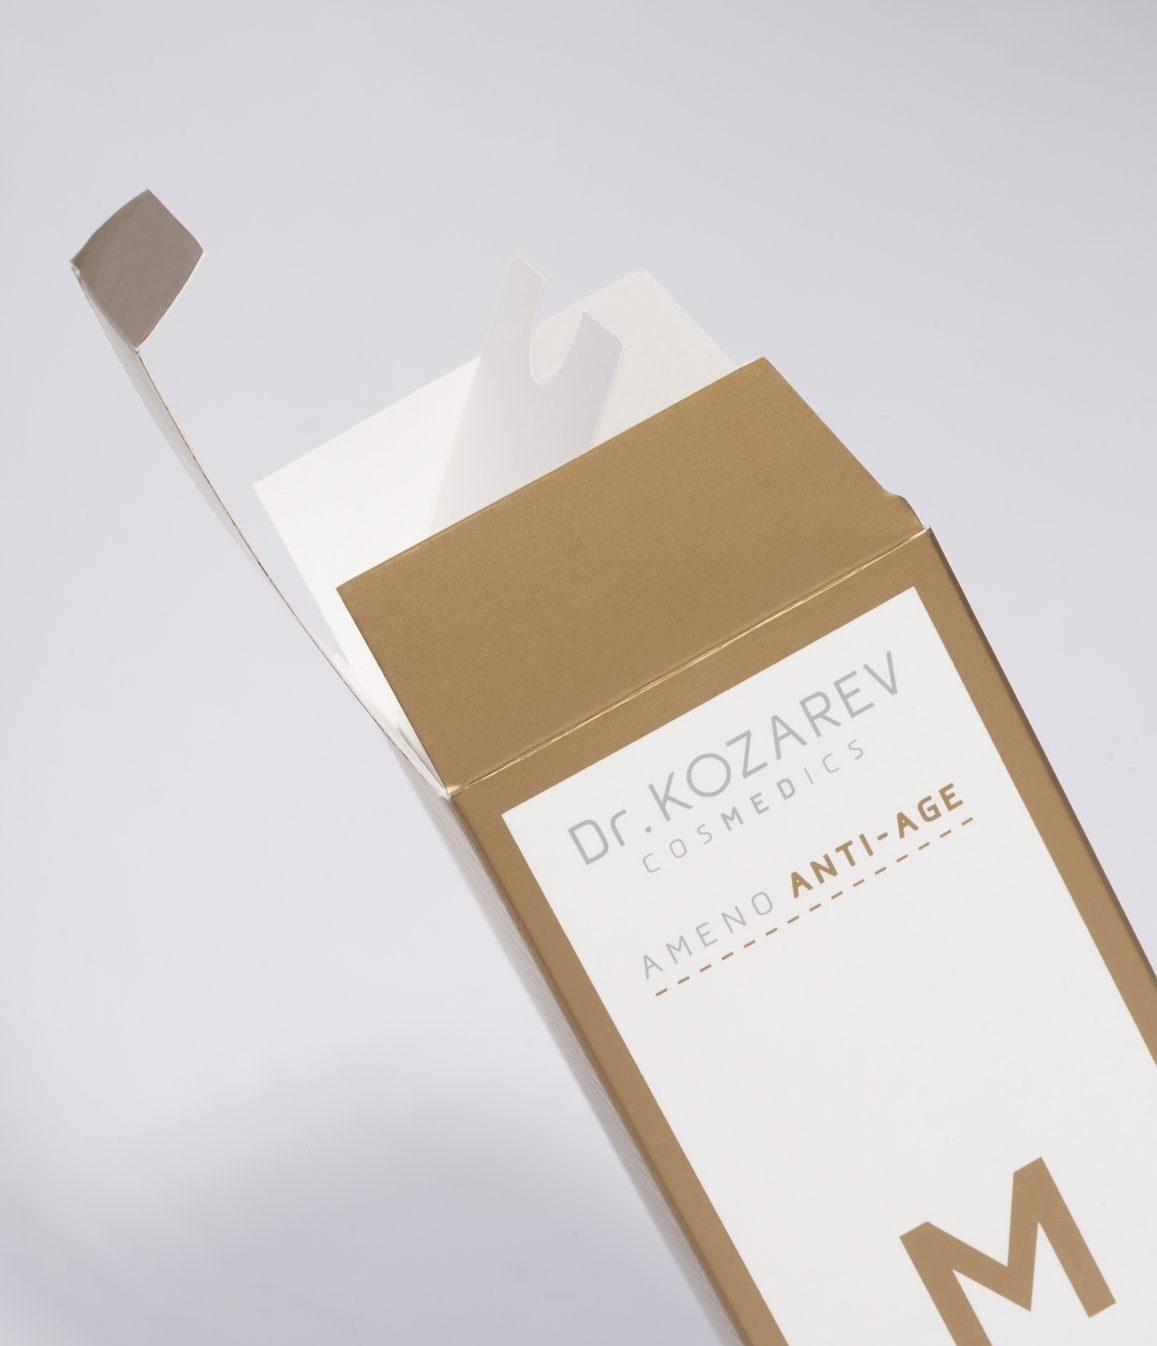 DrKozarev_Cosmetics_Shonski_packaging_AmenoAntiAgeLine_milk